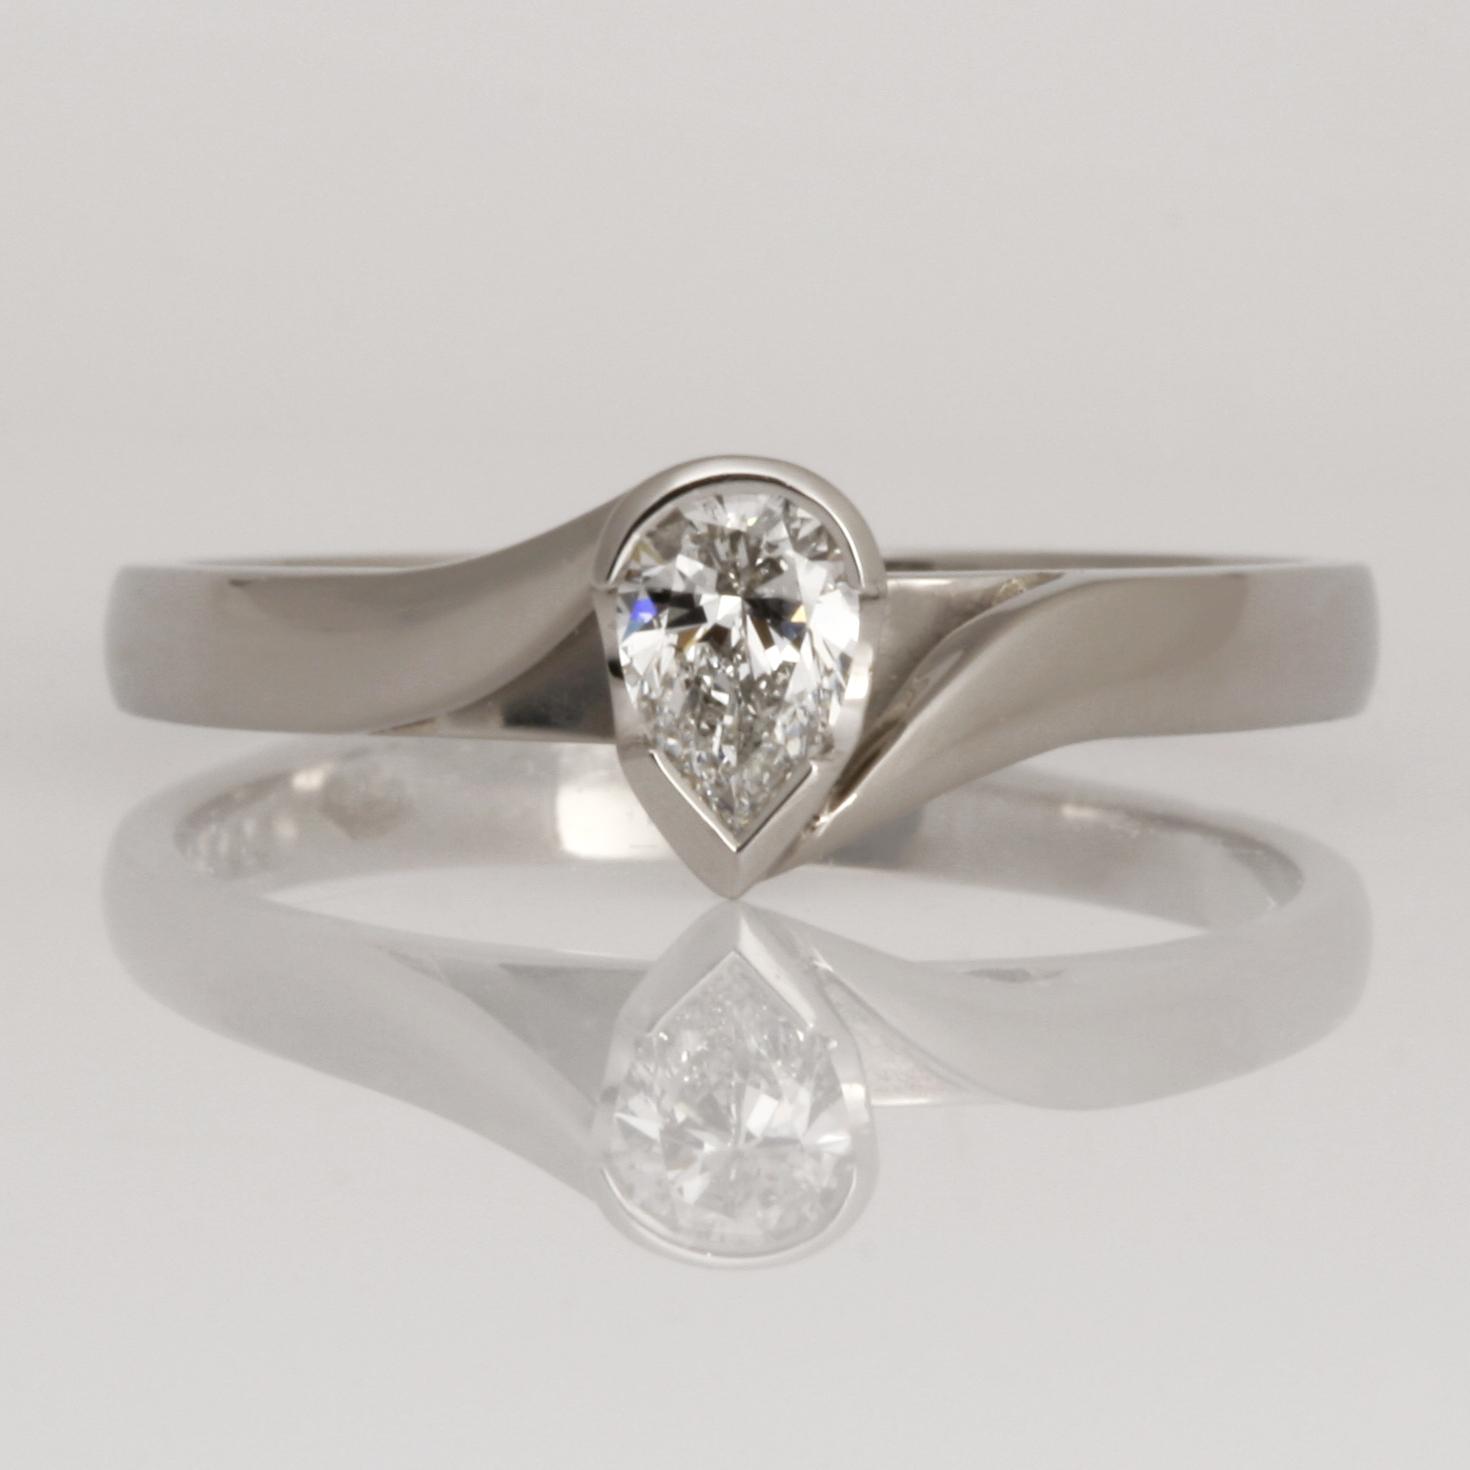 Handmade palladium ring set with pear shaped diamond